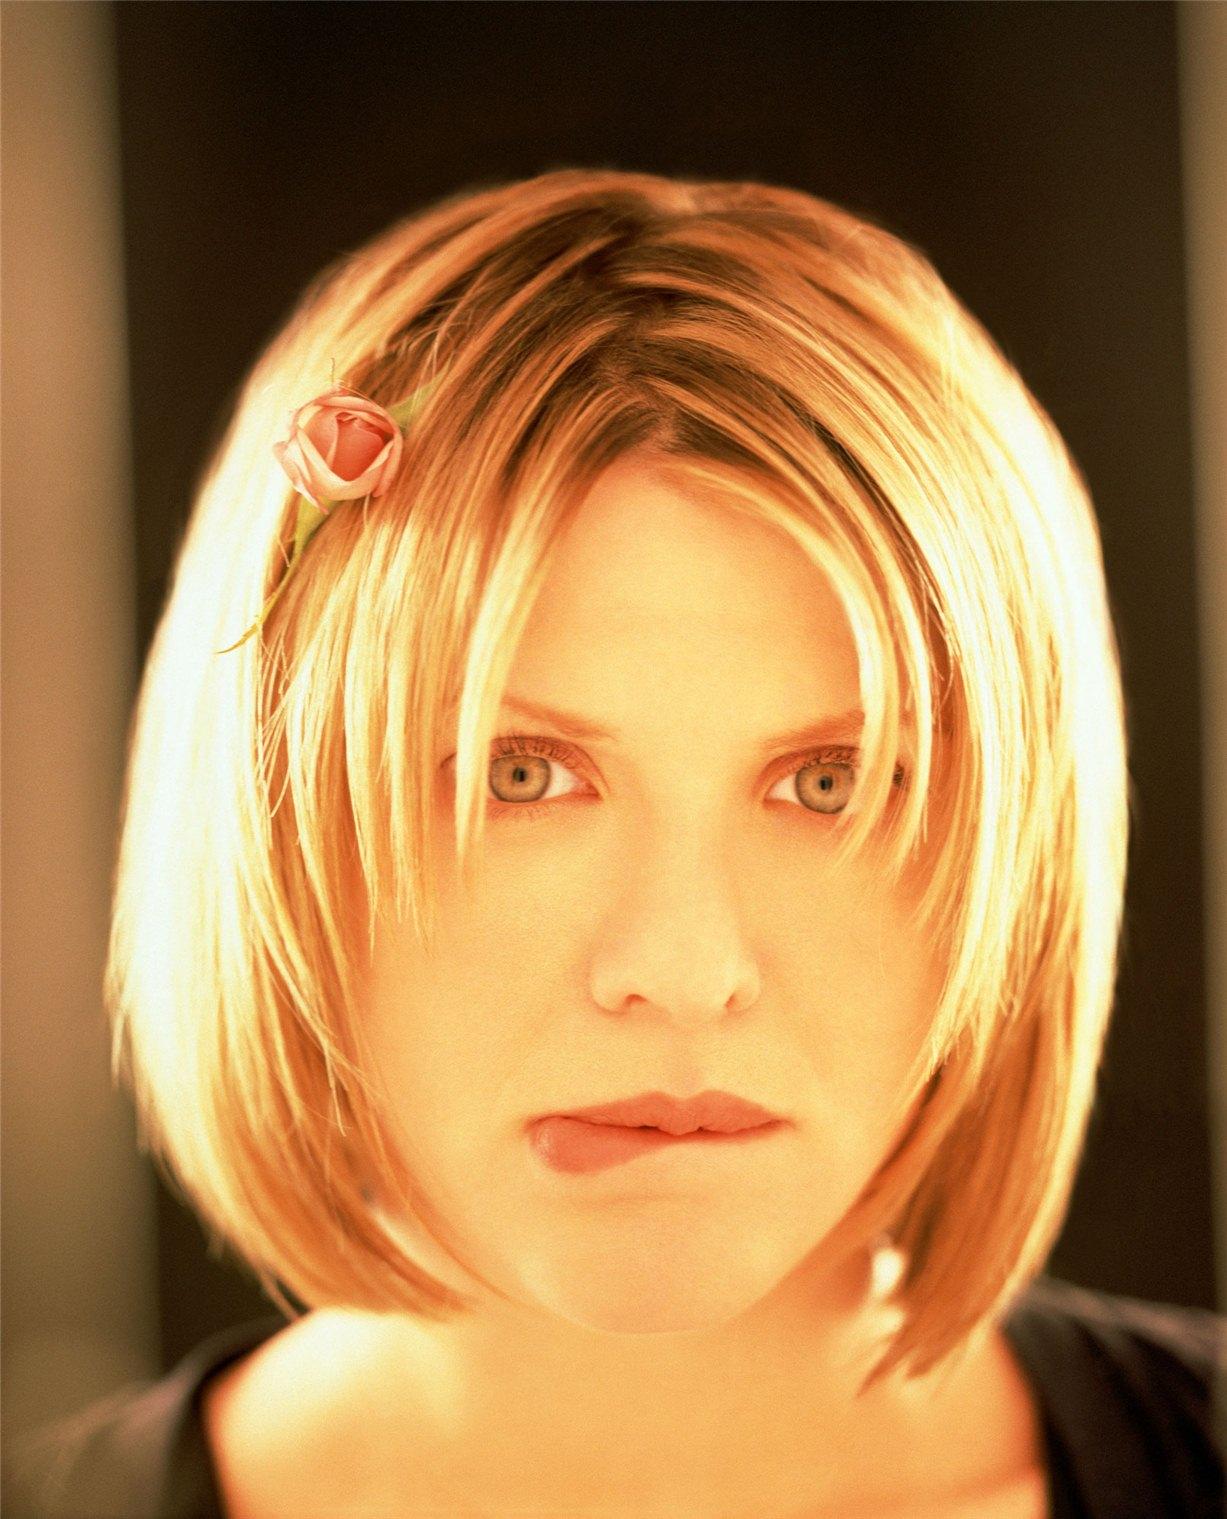 Courtney Love / Кортни Лав - звезды Голливуда, фотограф Firooz Zahedi